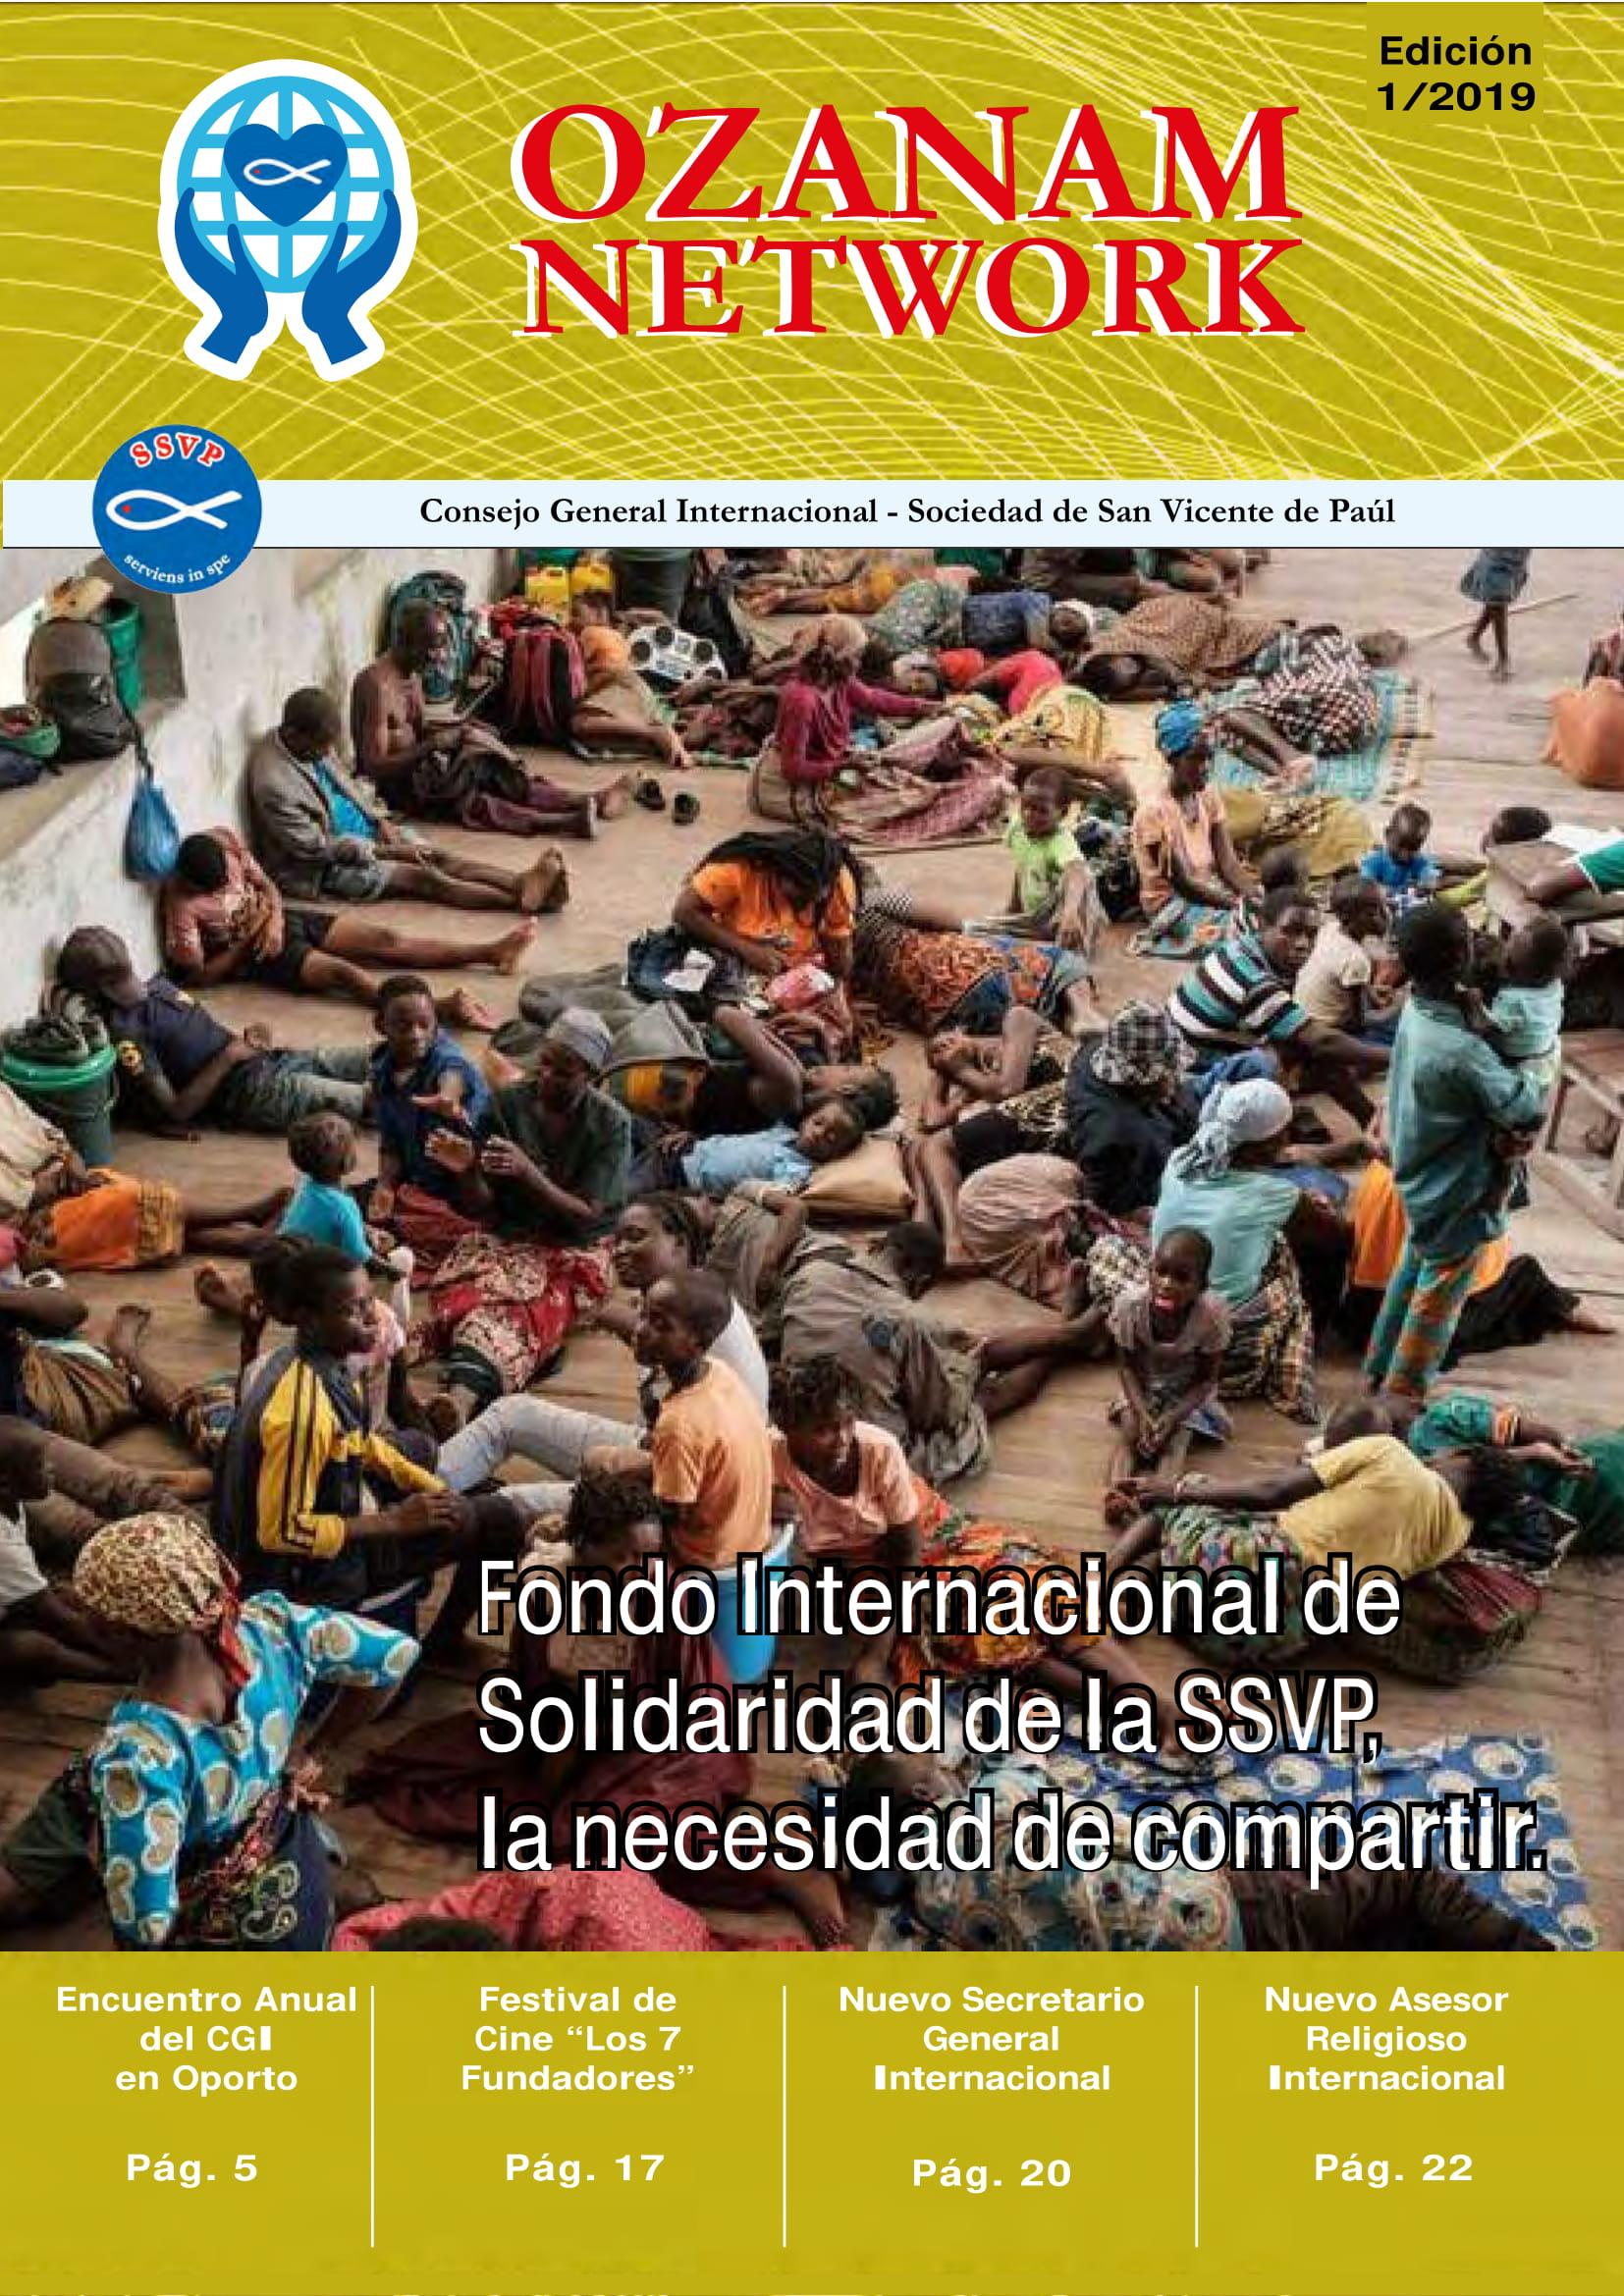 Revista Internacional – Ozanam Network 01/2019